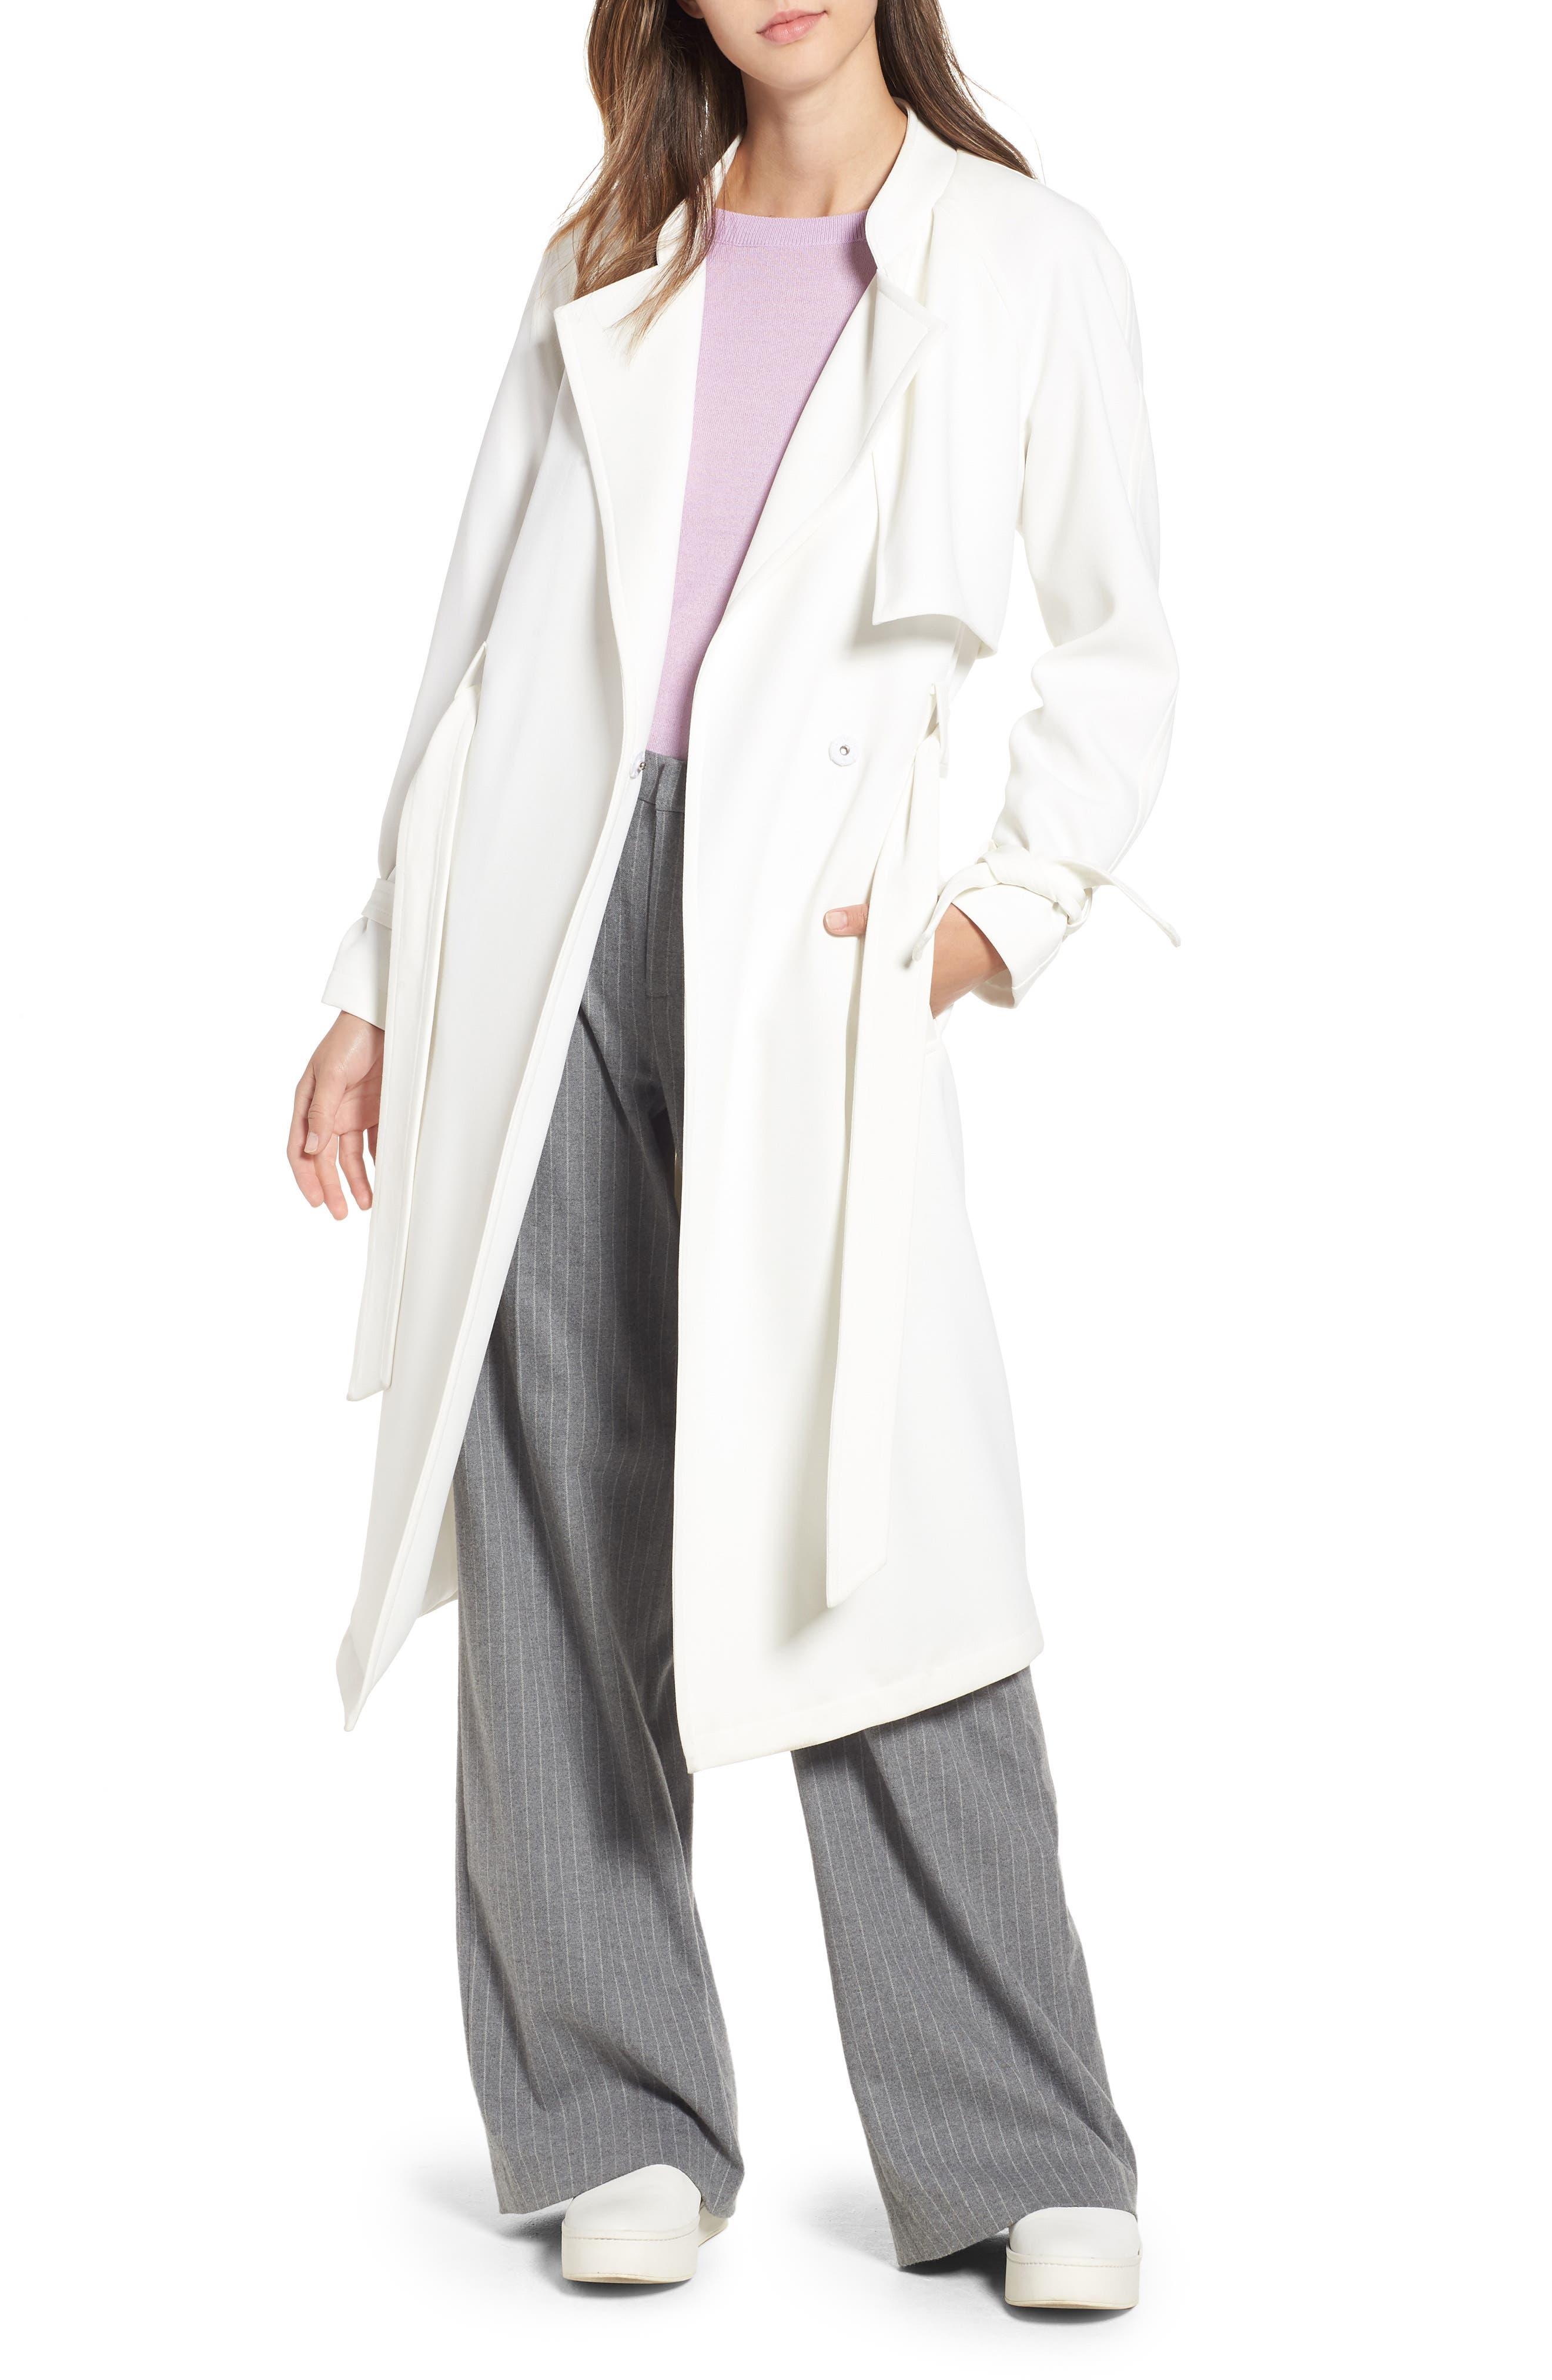 RACHEL RACHEL ROY, Luxe Crepe Trench Coat, Main thumbnail 1, color, WHITE